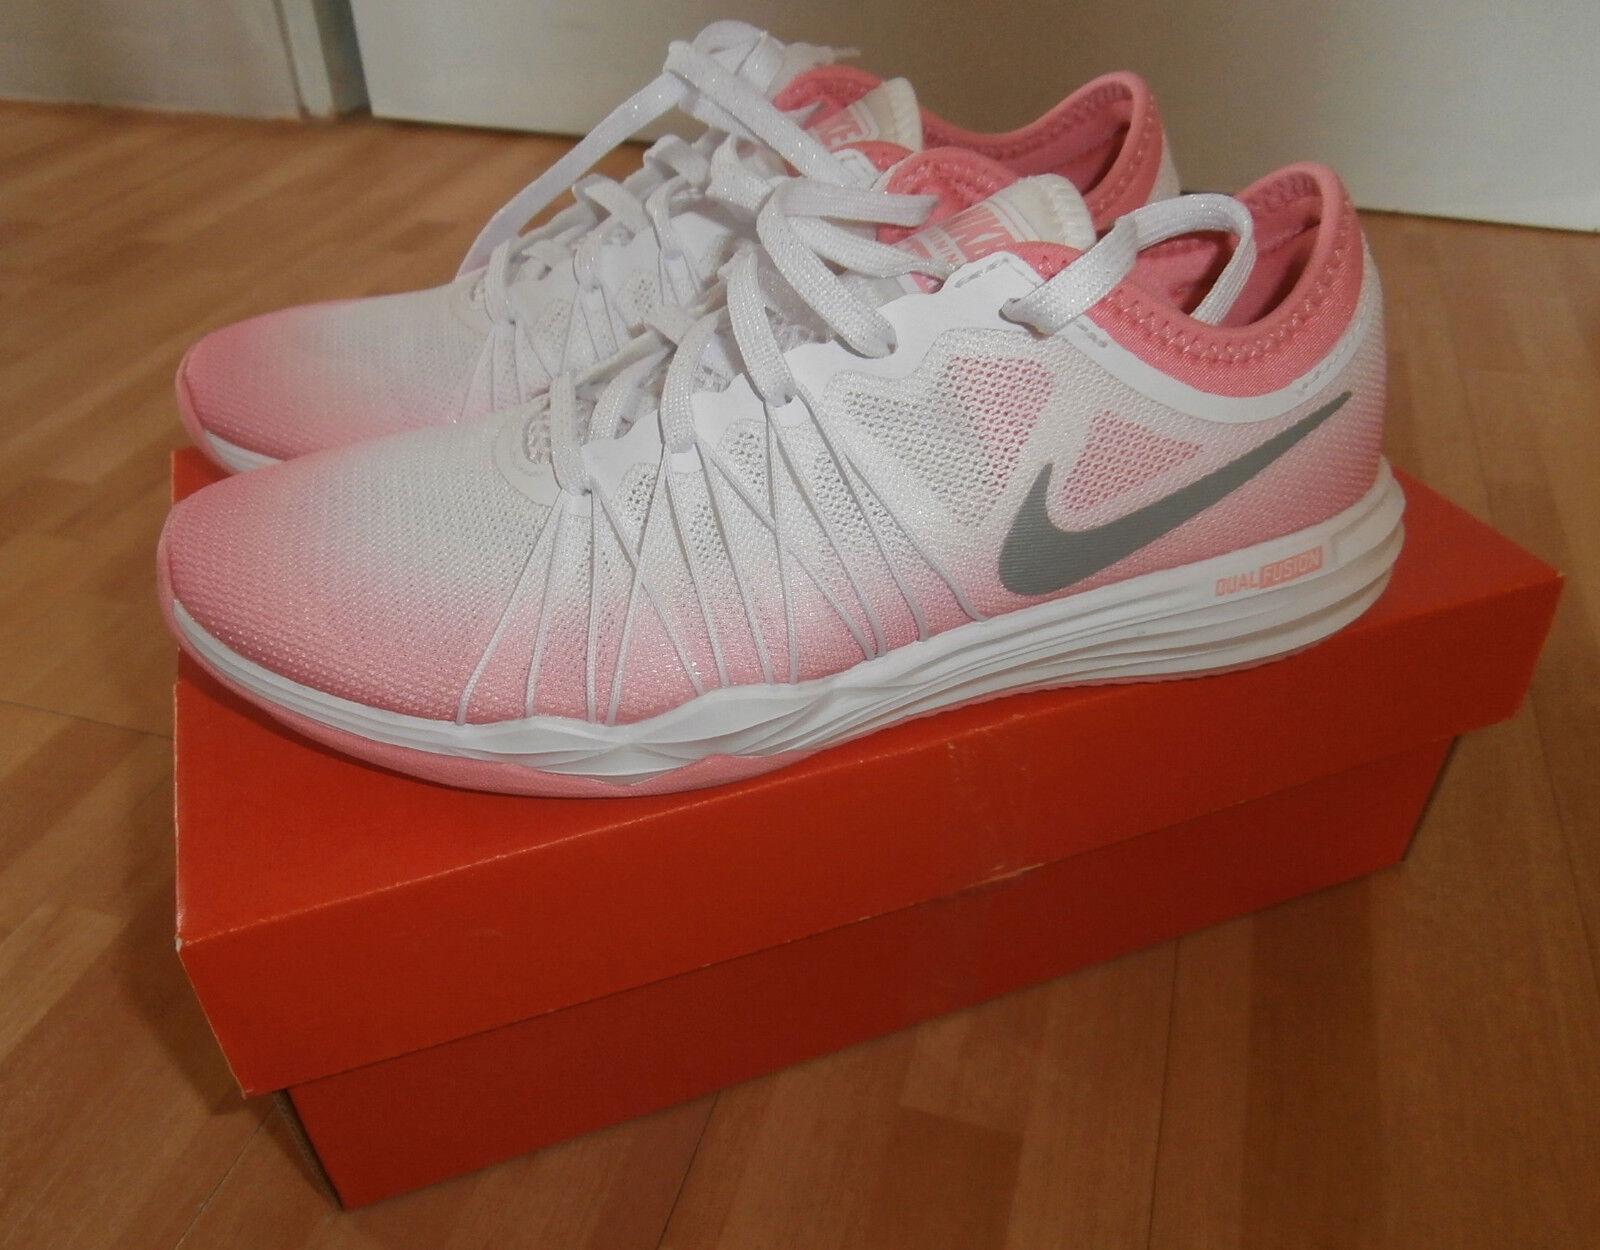 NIKE Dual 6.5 Fusion Größe 6.5 Dual / 37,5  Damen Sneaker  rosa/weiß  Wie neu e997b3